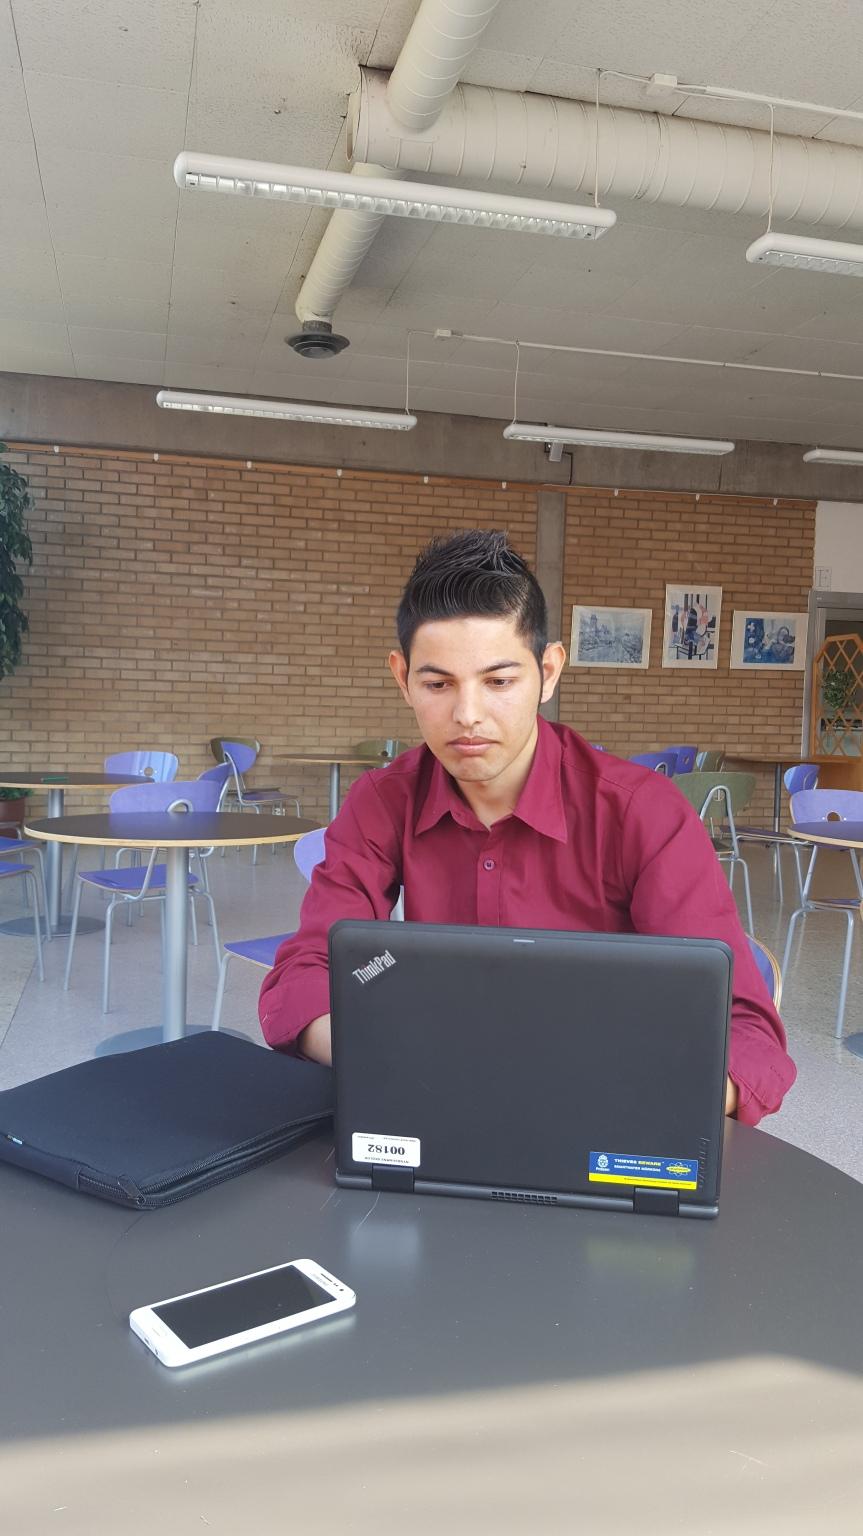 jamal dator i skolan